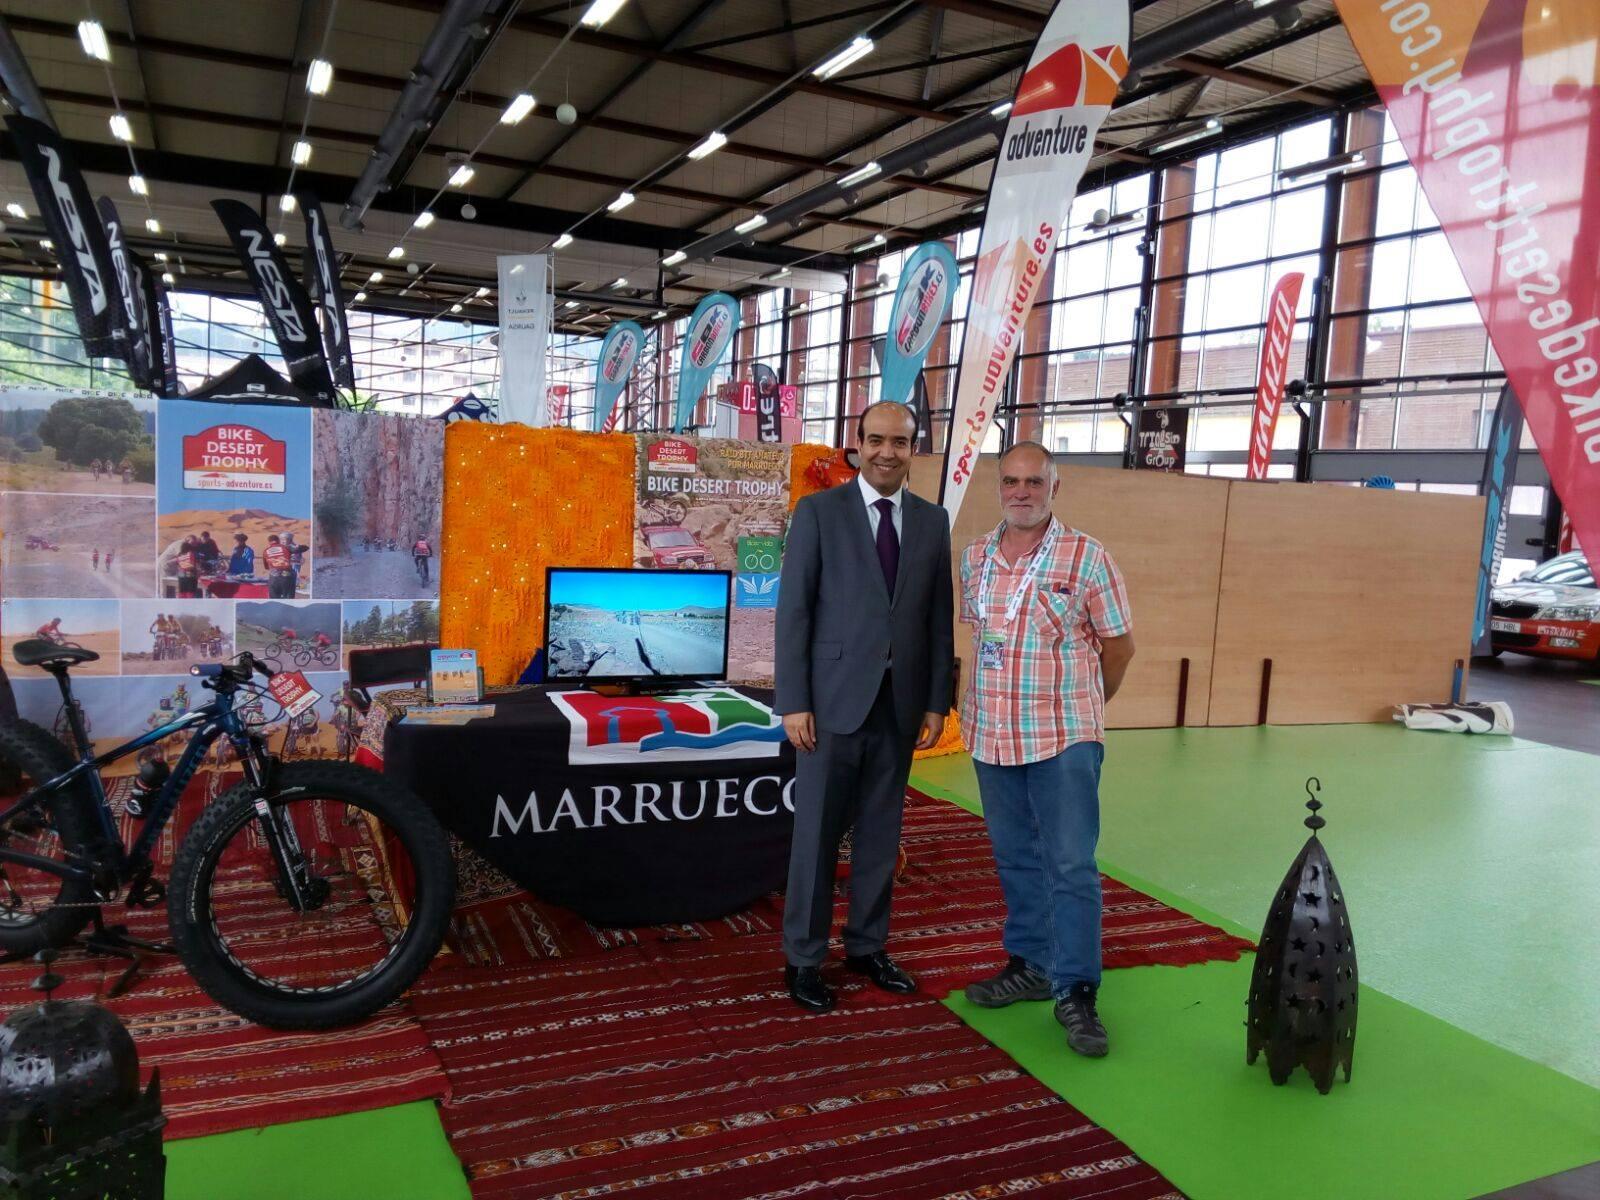 El sr kamal mehdaoui c nsul de marruecos con la bike for Oficina de turismo de marruecos